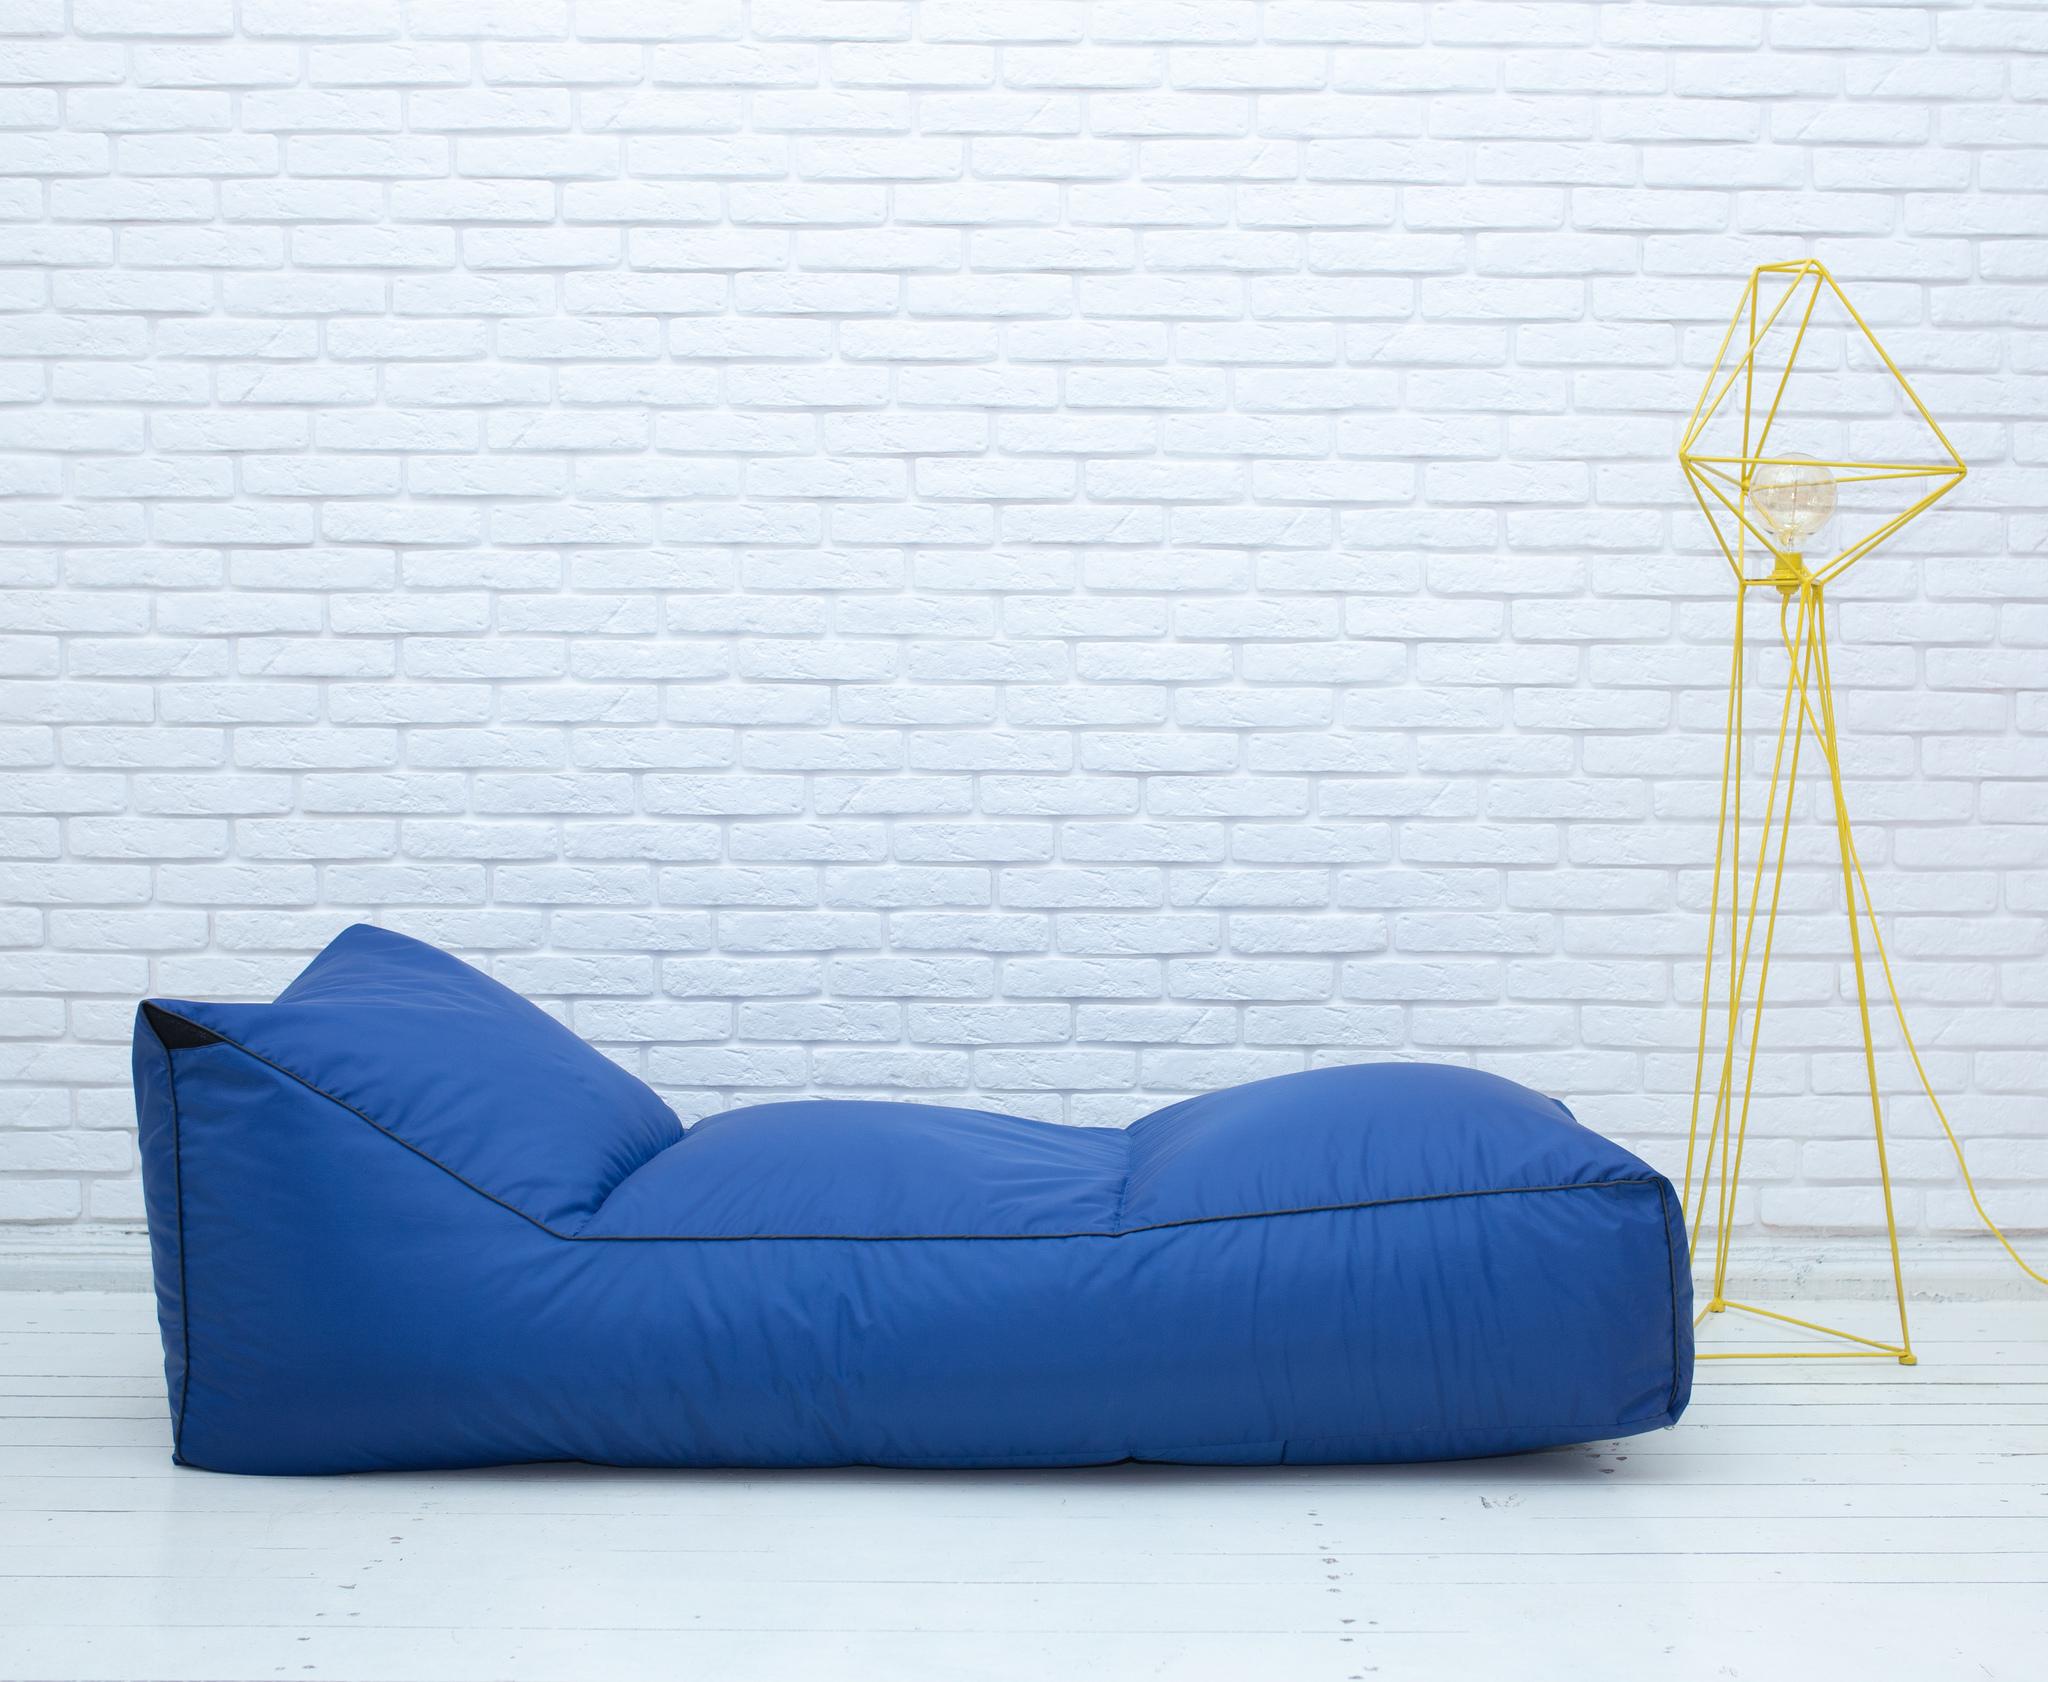 Шезлонг плащёвка (синий)